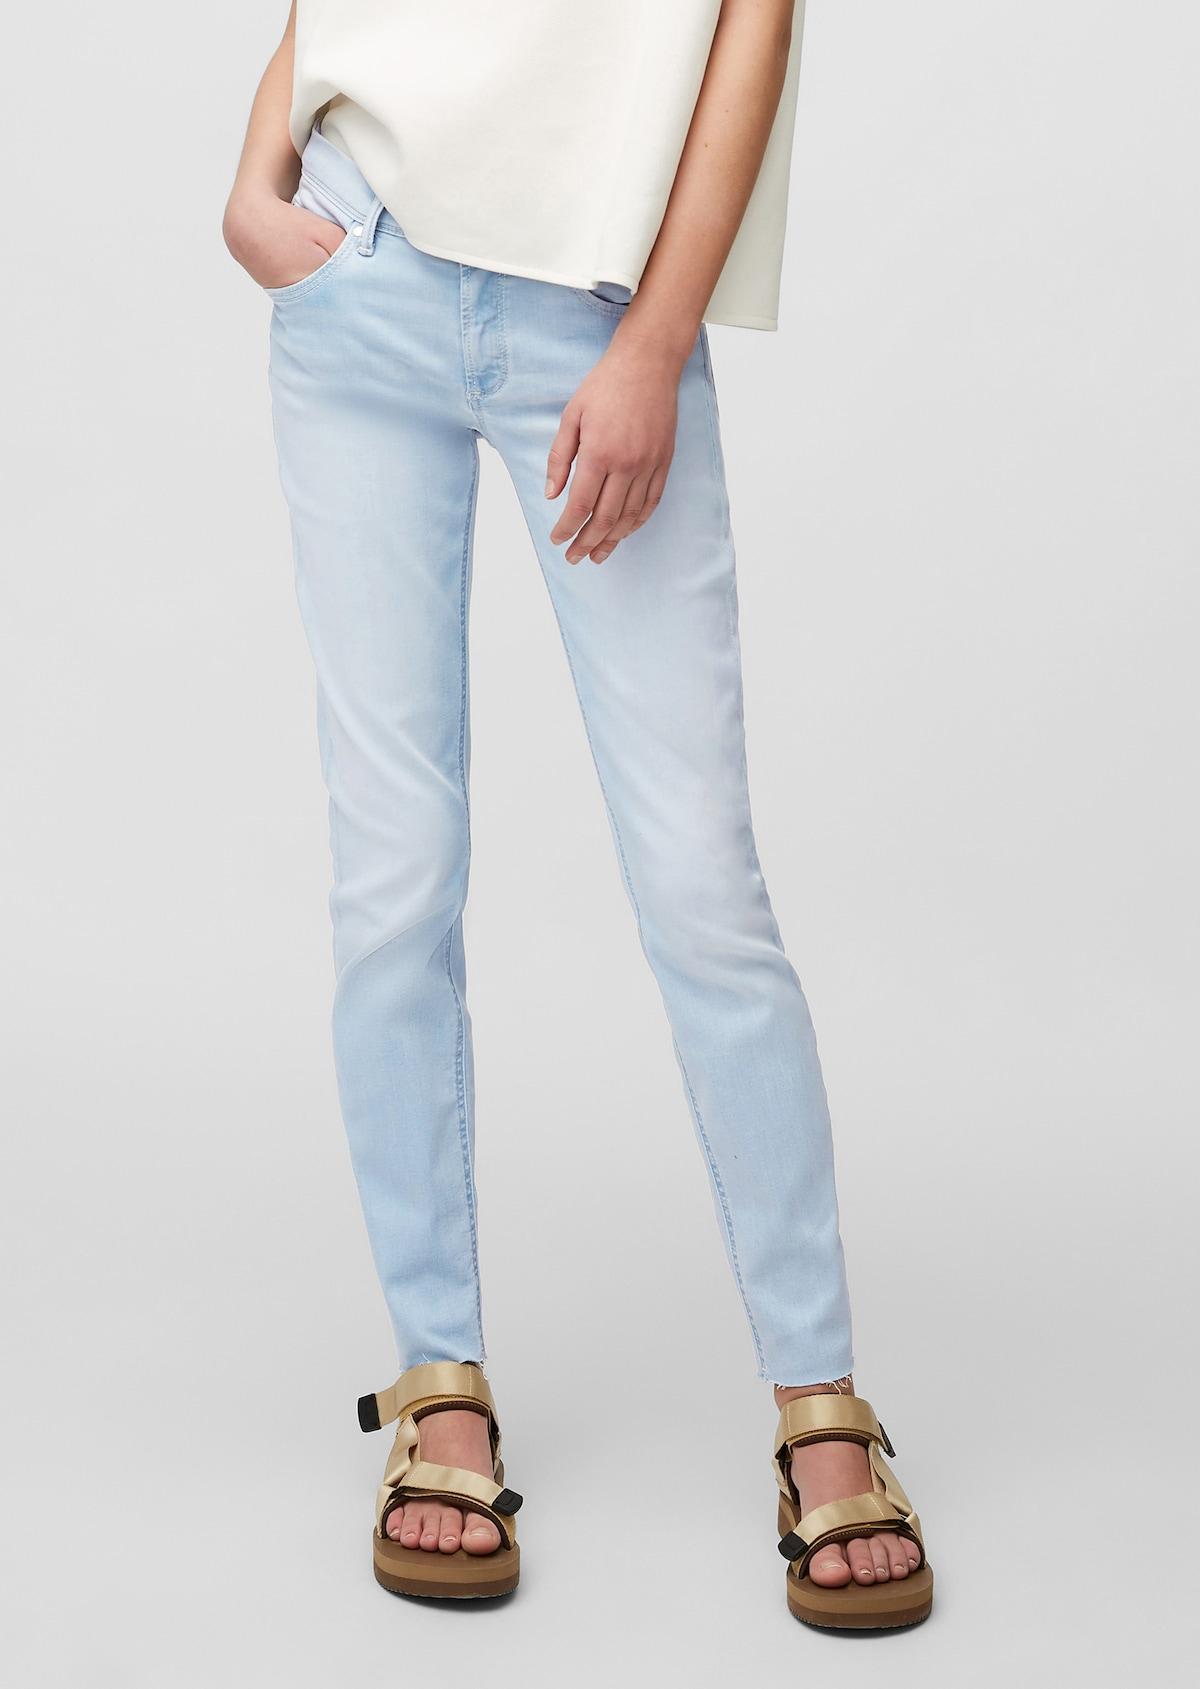 Blau Marc O/'Polo Alva Skinny Fit Jeans W27,28,29 L30,32